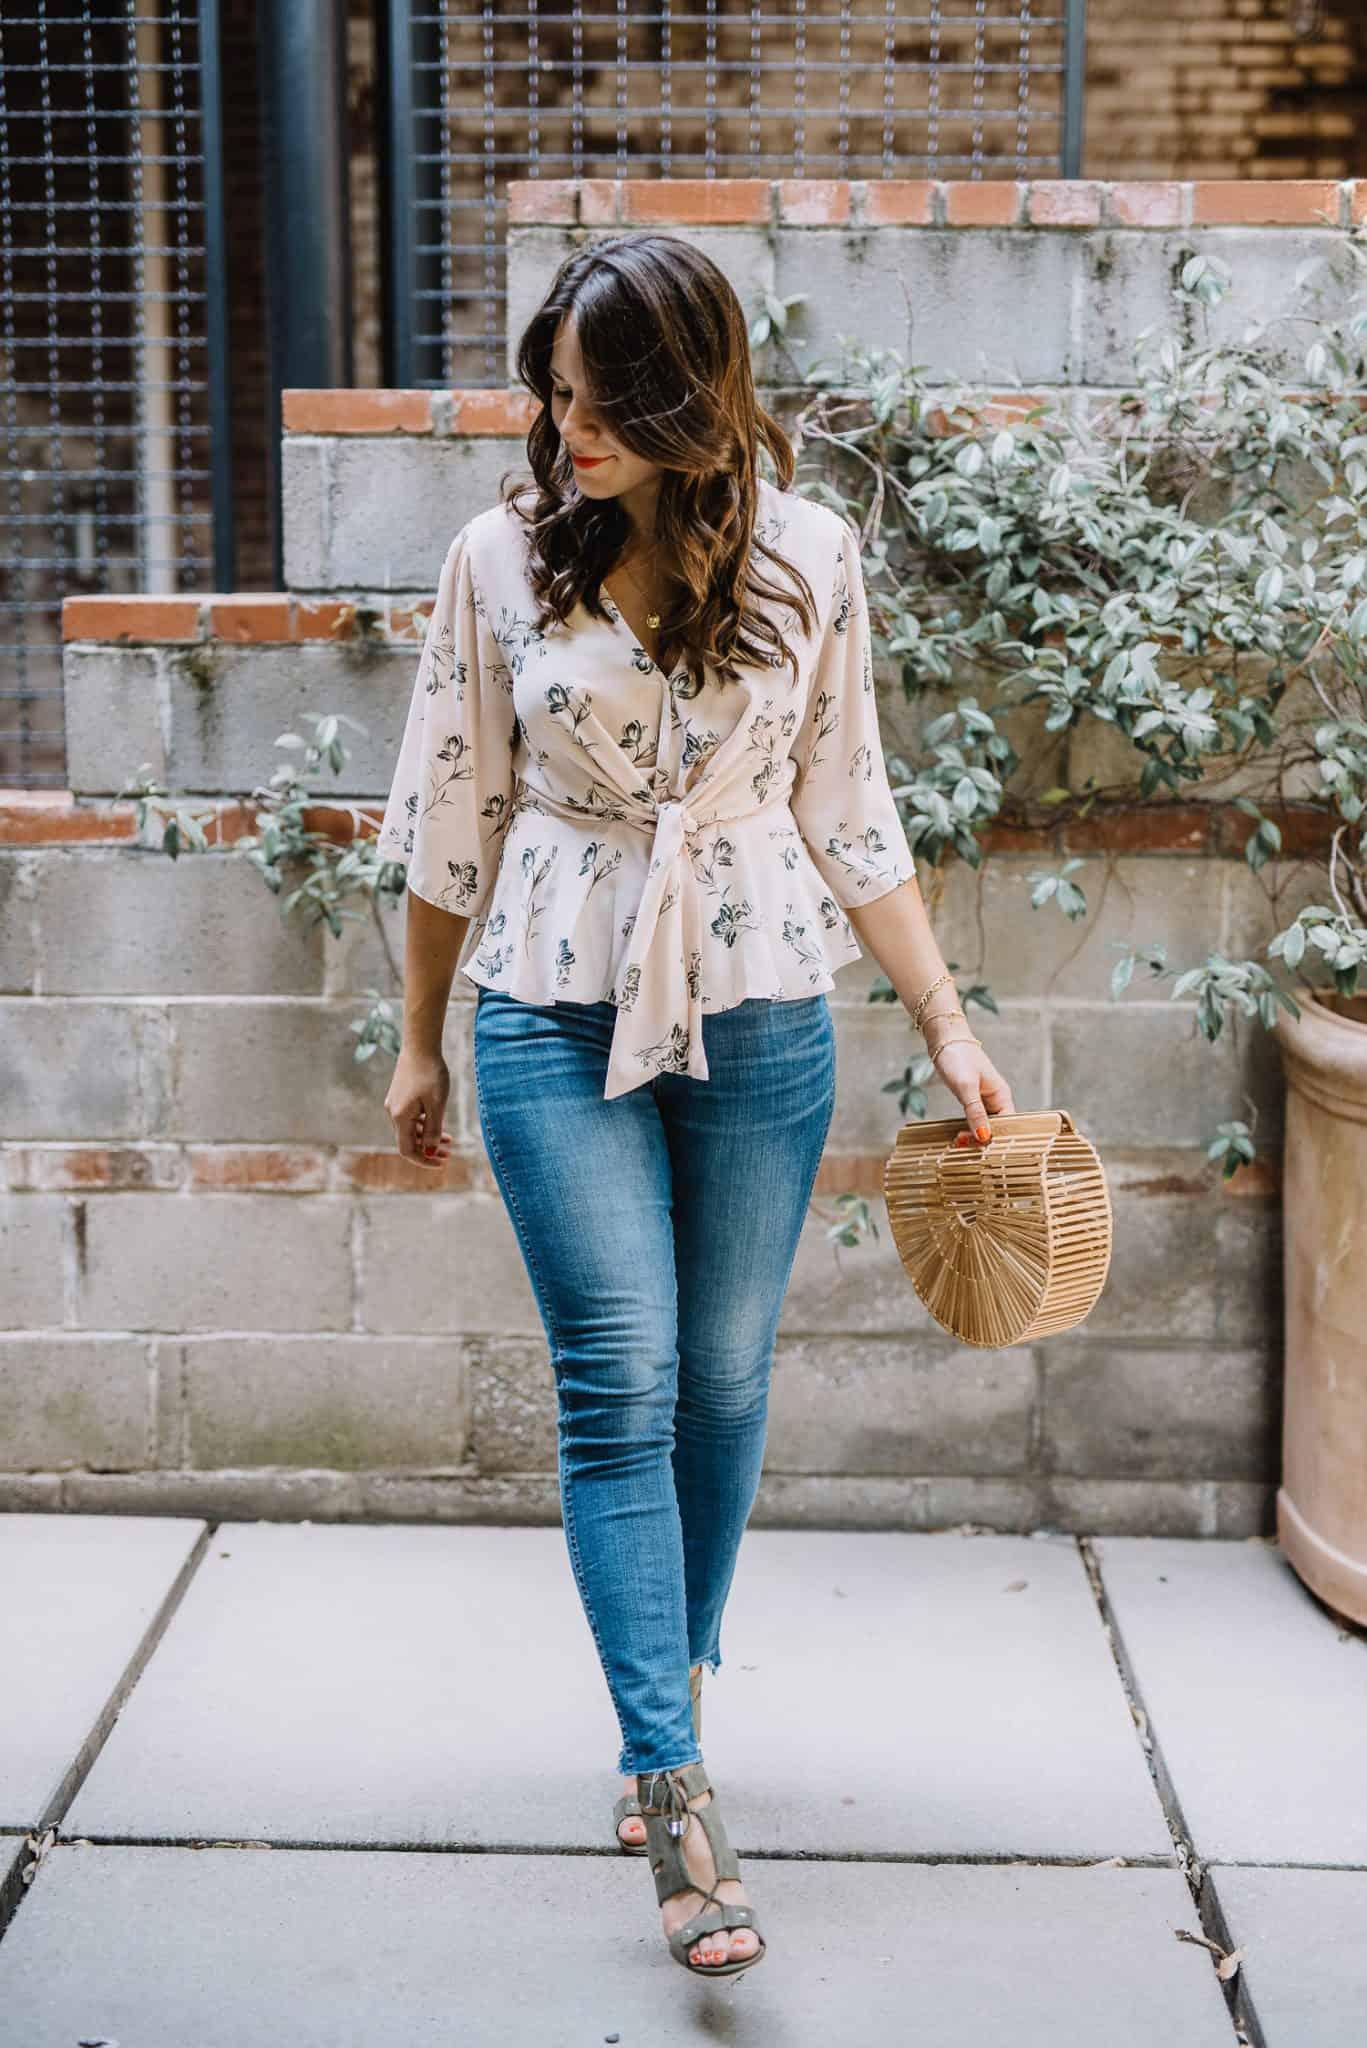 cult gaia bag, madewell jeans, wayf top